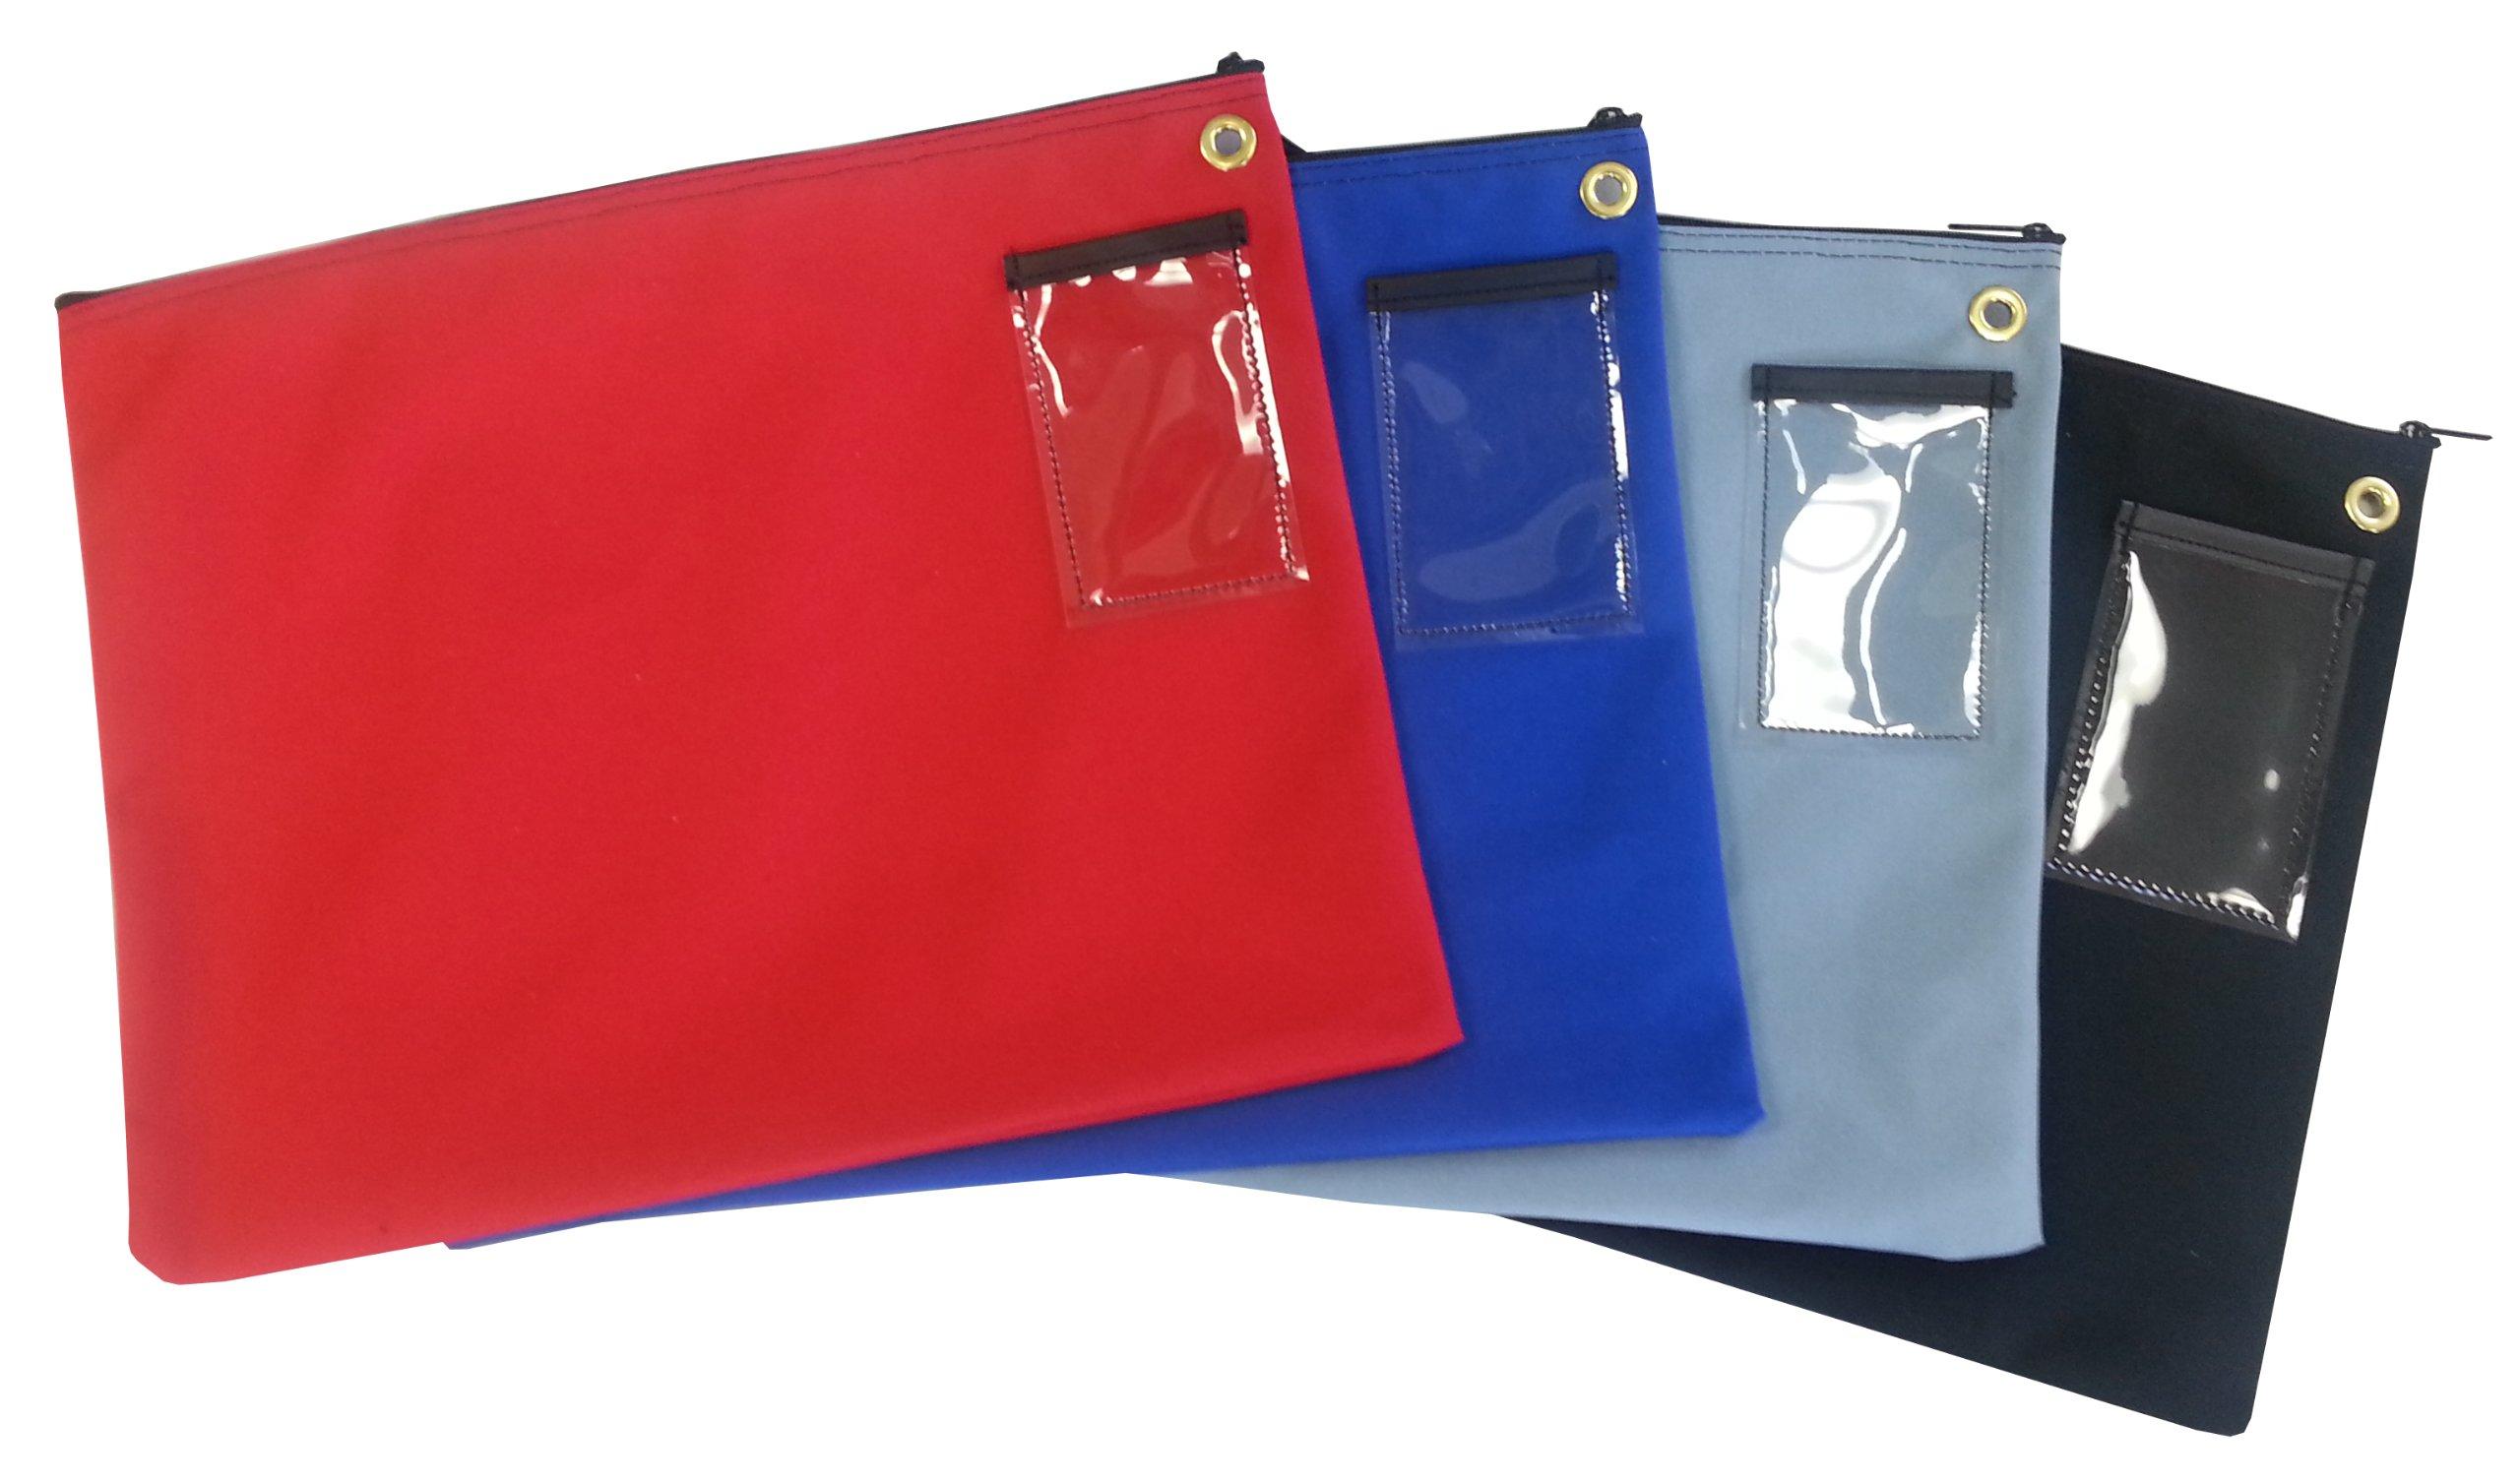 Interoffice Mailer Canvas Transit Sack Zipper Bag 18w x 14h Black by Cardinal Bag Supplies (Image #1)